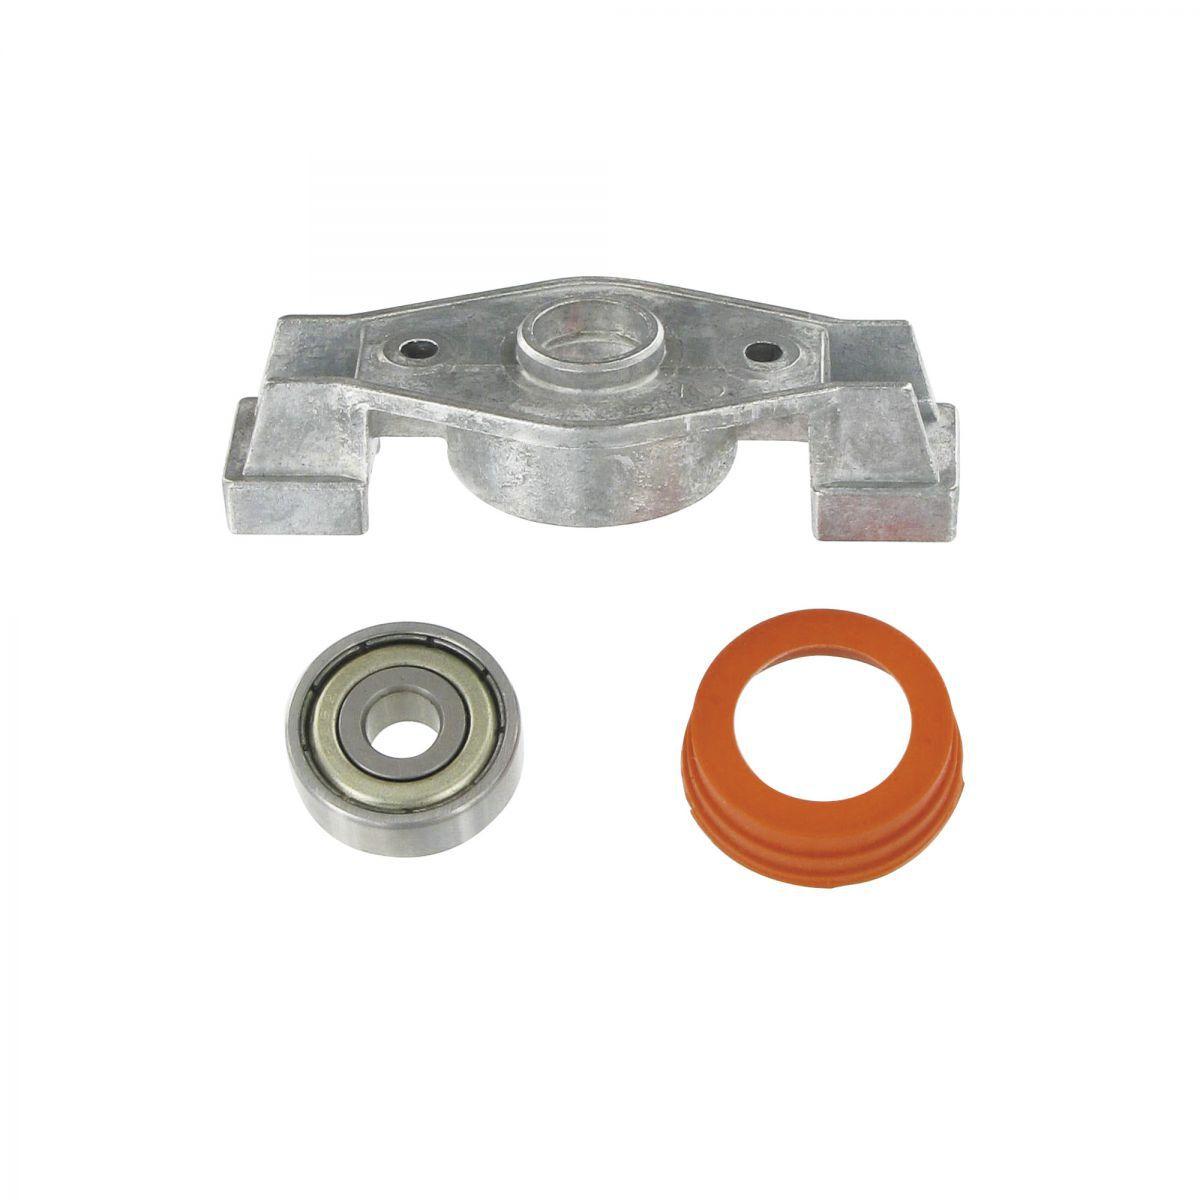 set ball bearing holder and rear bar for crouzet motor 23313606 75520137 79207195